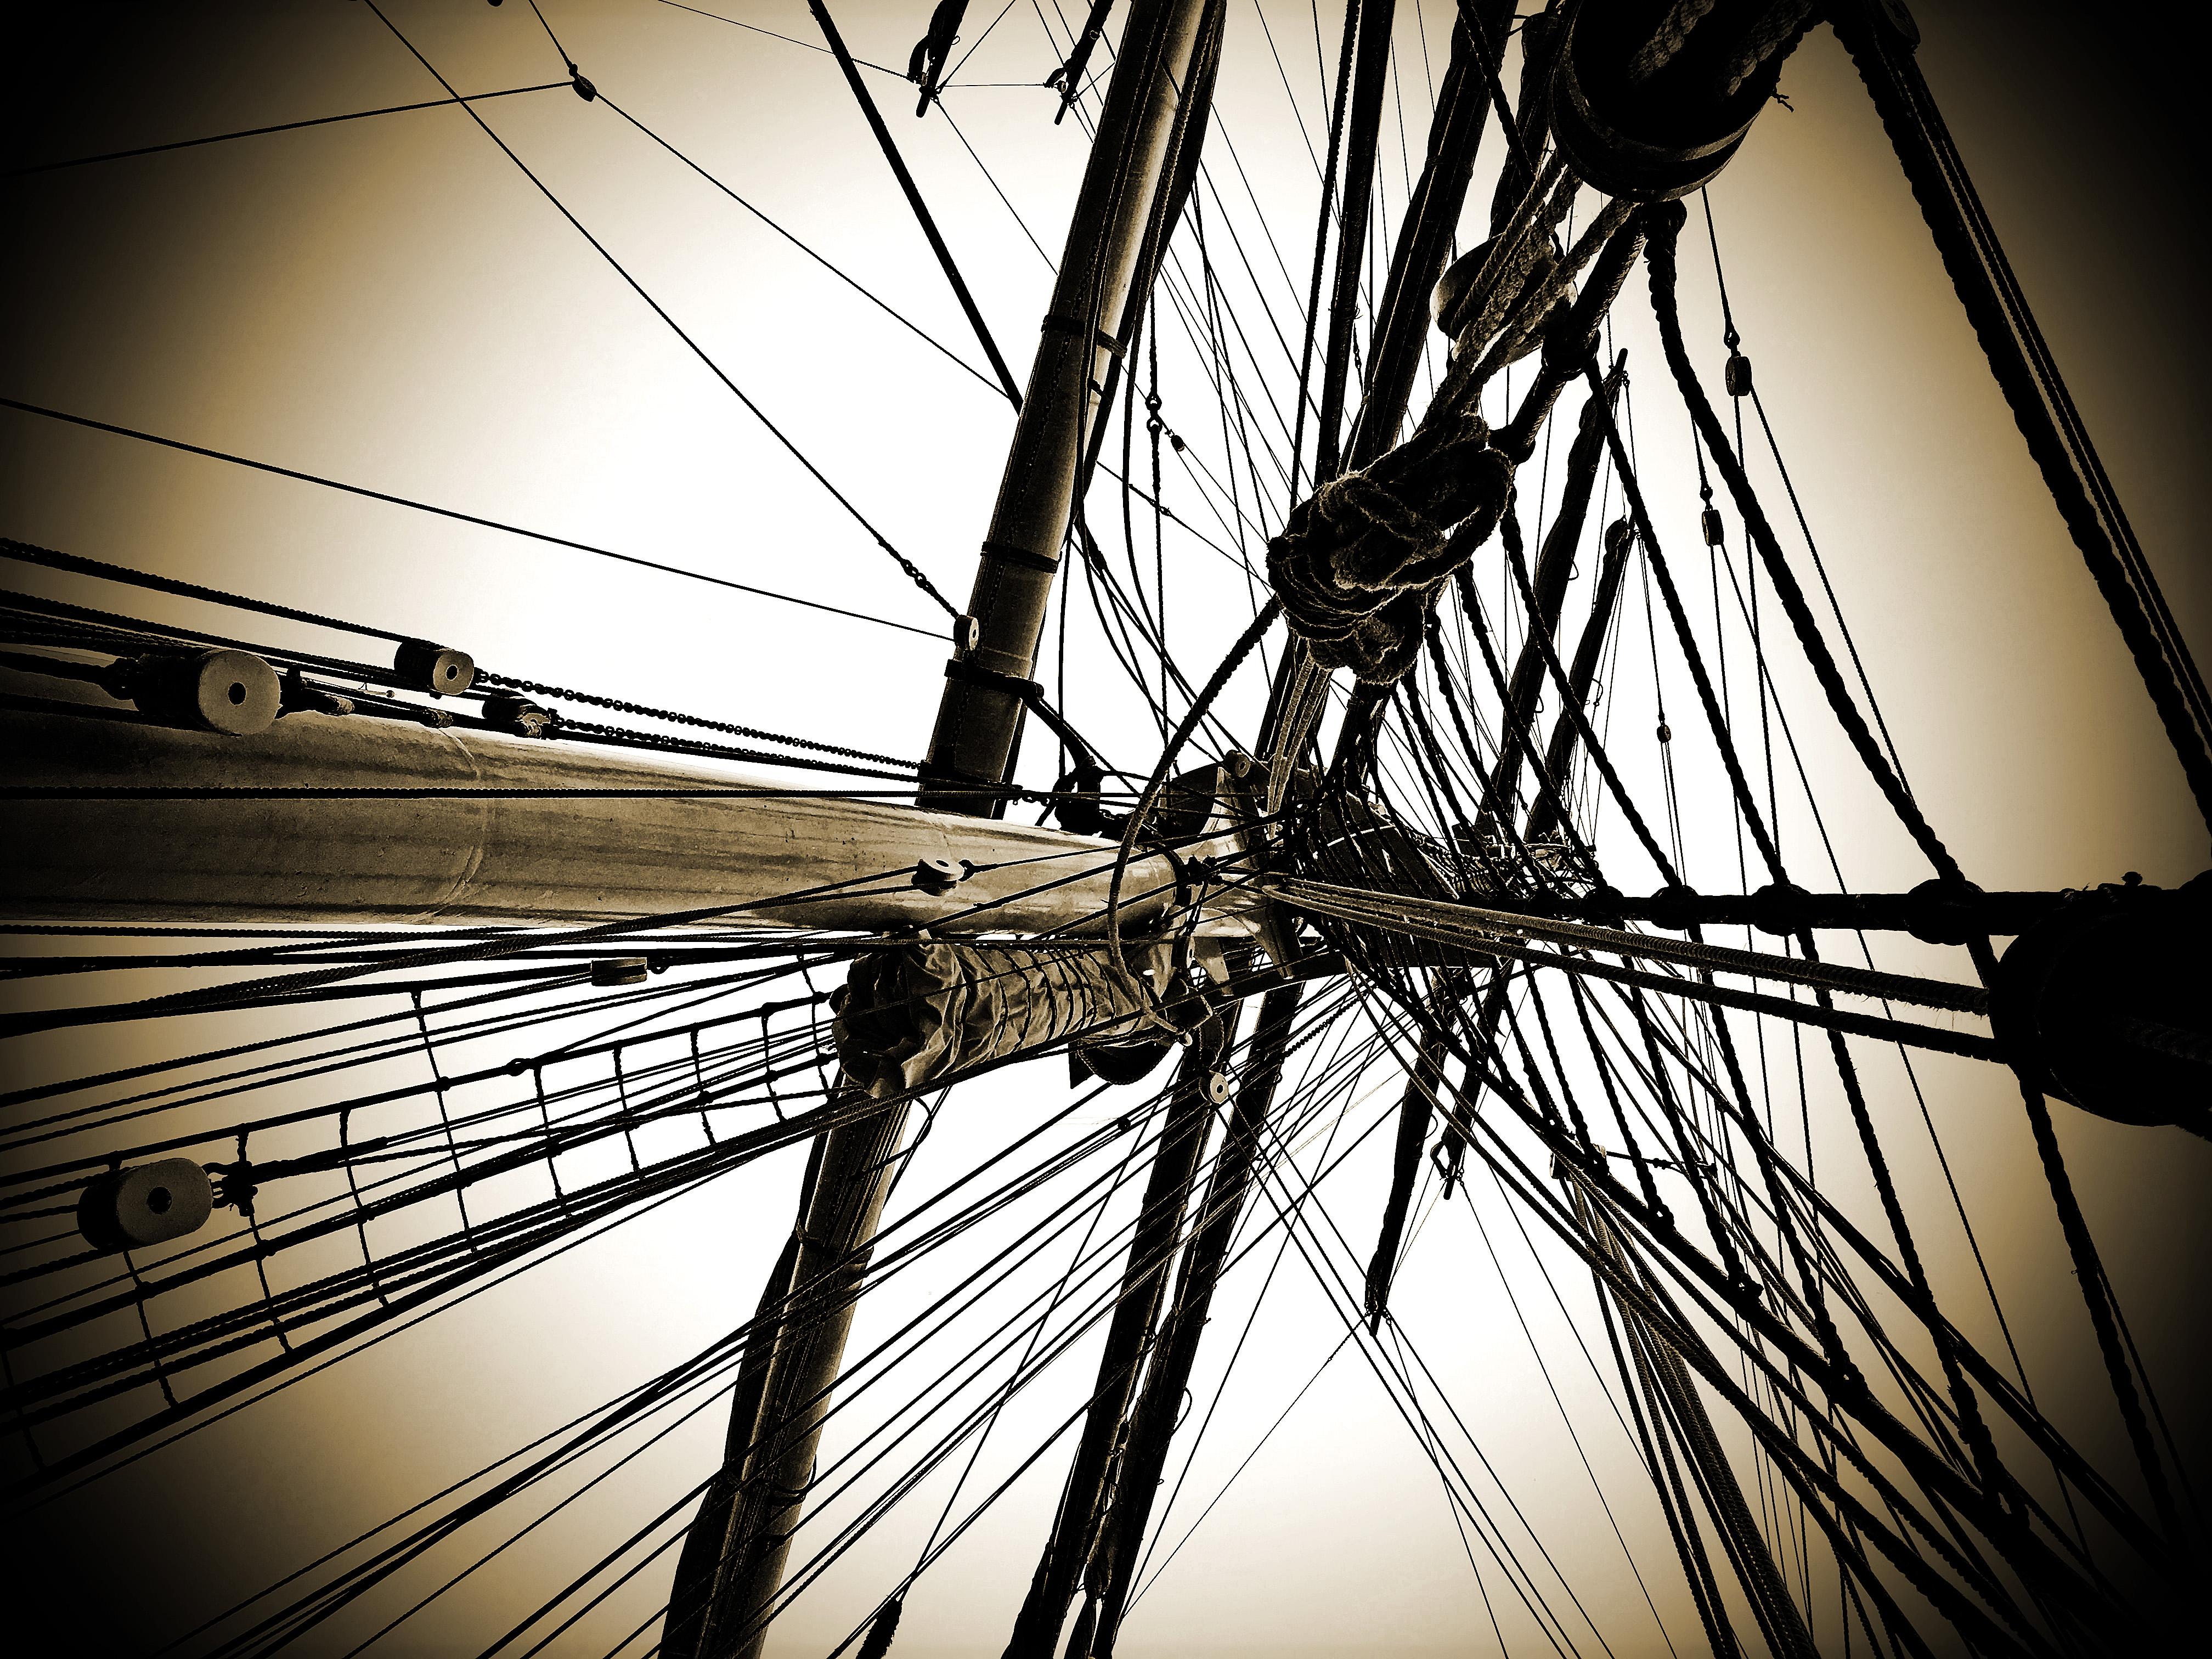 Galveston: Tall Ships